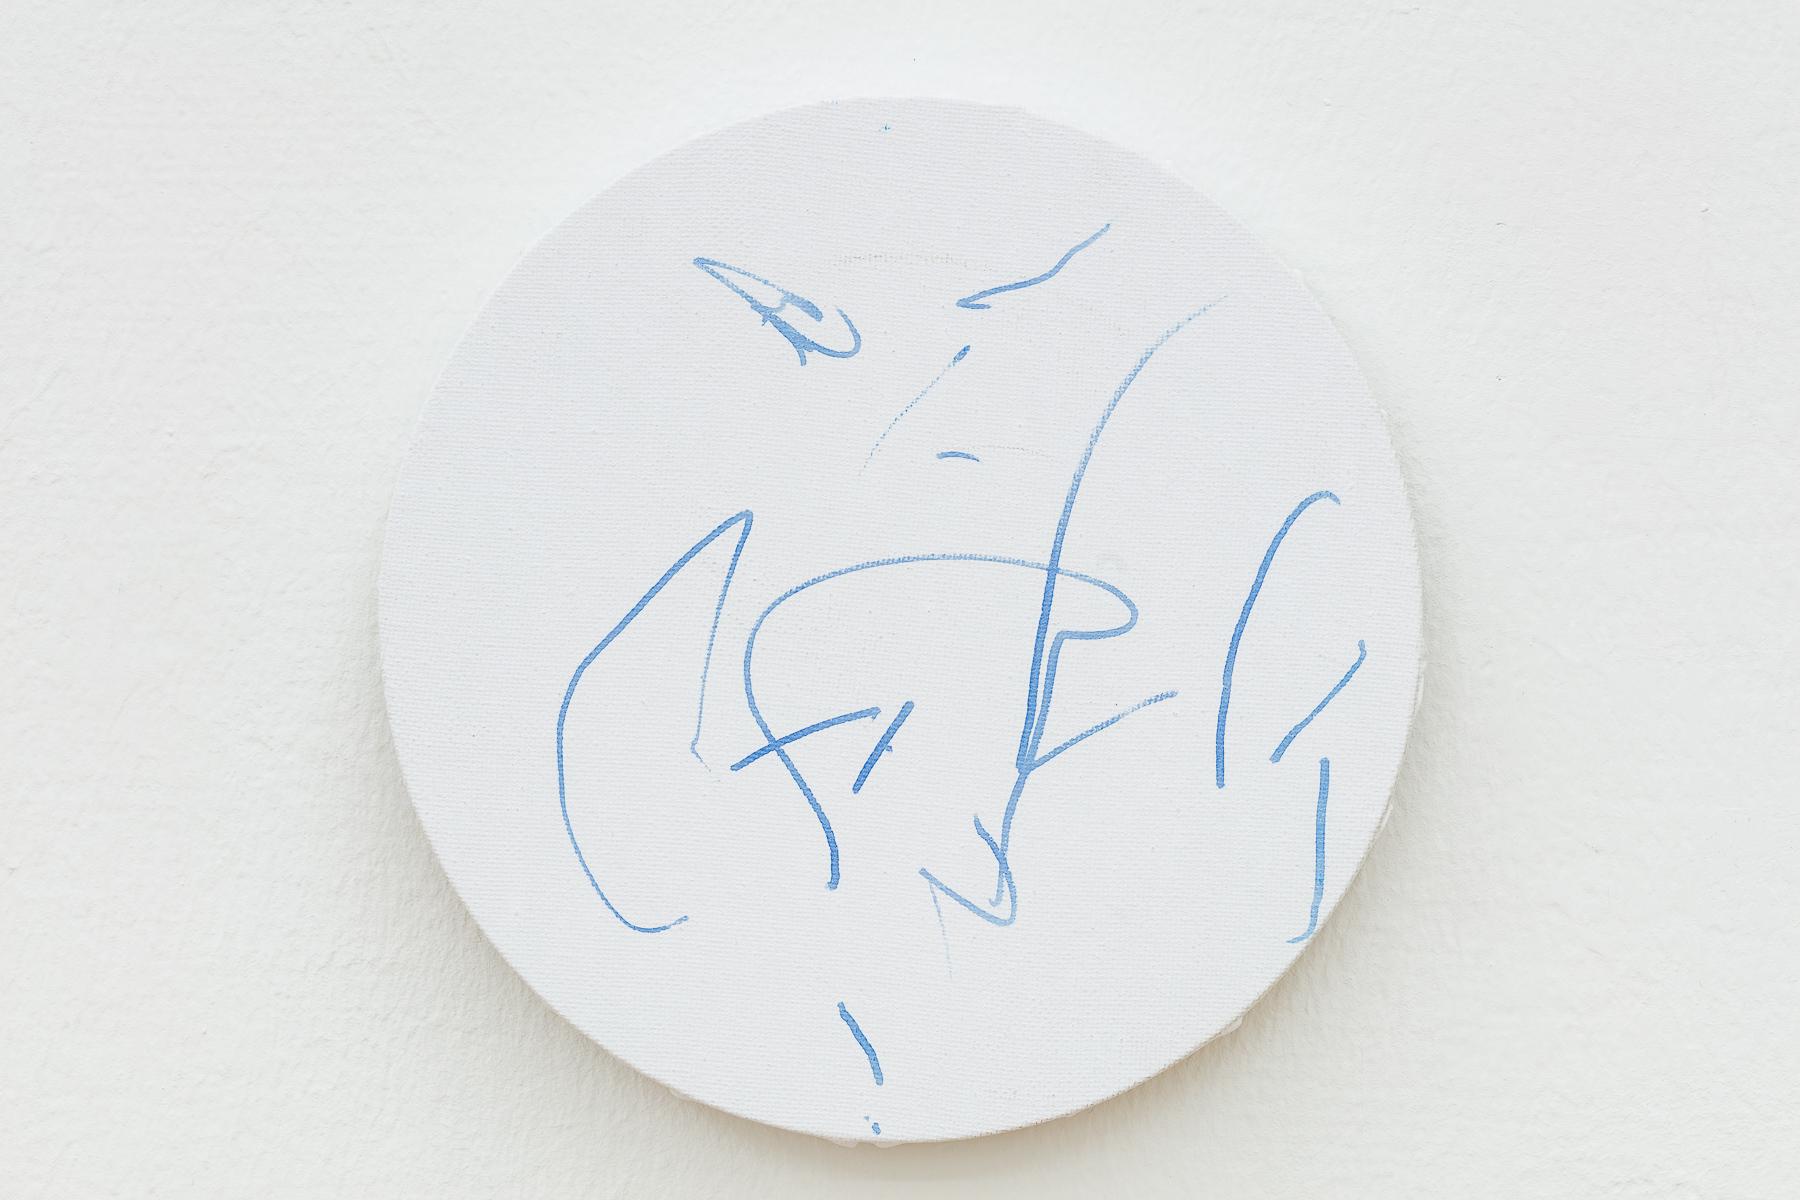 2019_05_20_Elke-Krystufek_Croy-Nielsen_by-kunst-dokumentation-com_033_web.jpg